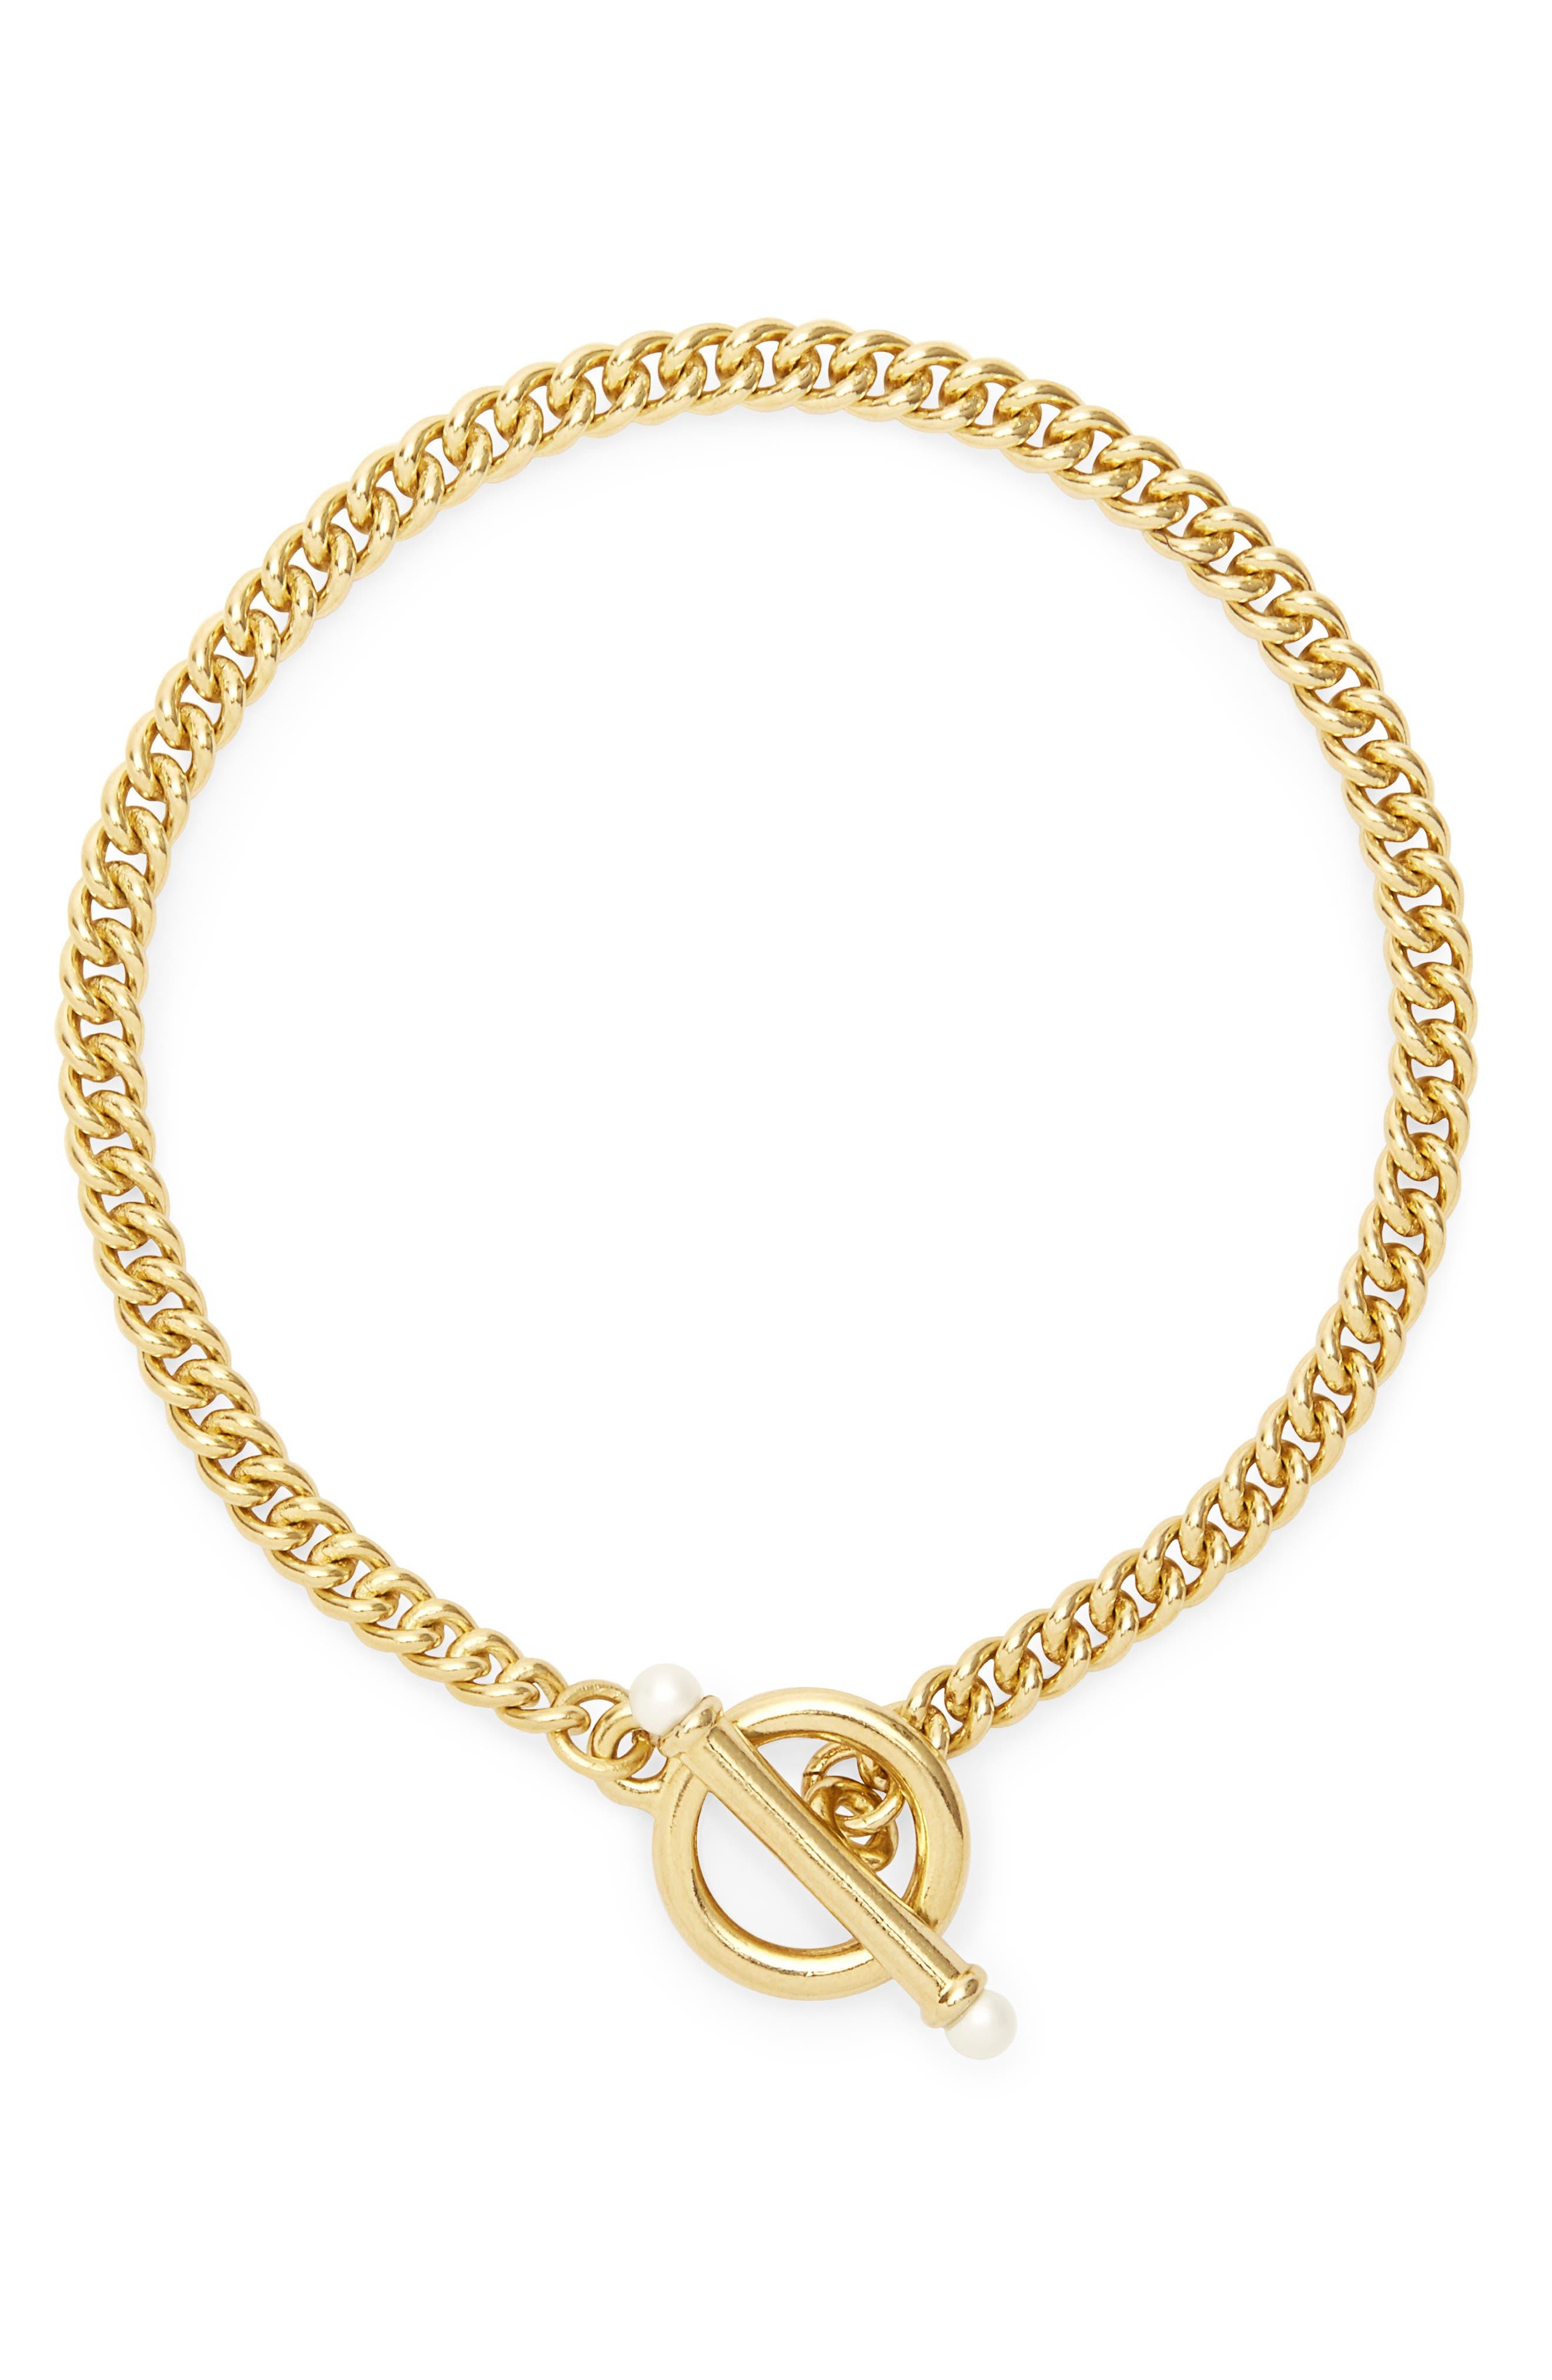 Stella Imitation Pearl Toggle Bracelet